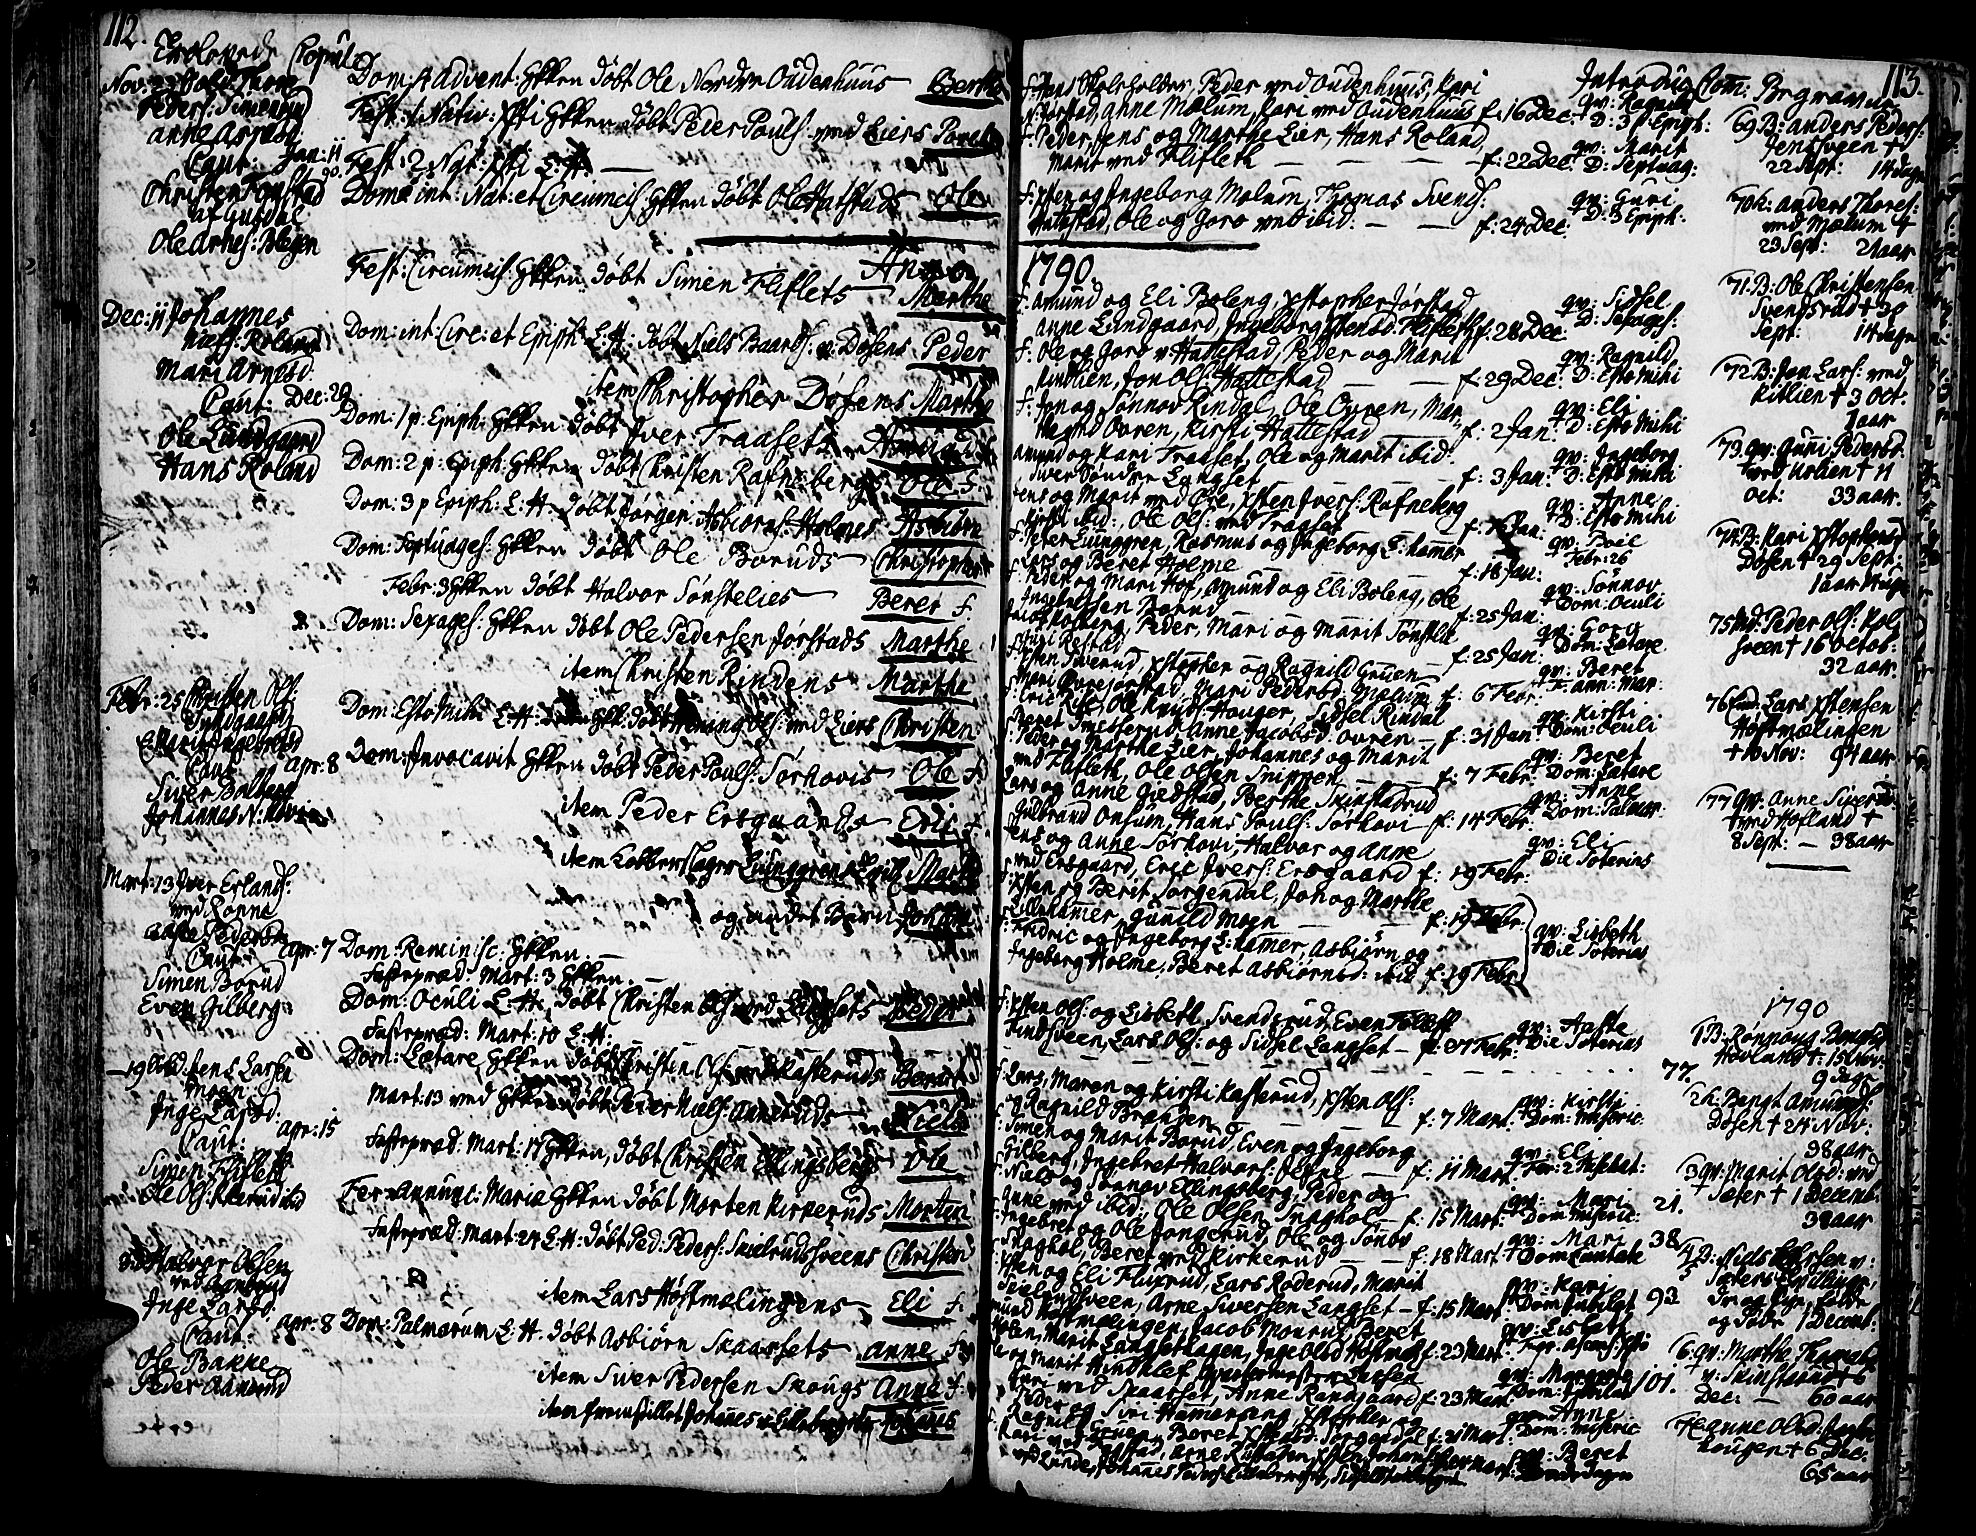 SAH, Fåberg prestekontor, Ministerialbok nr. 2, 1775-1818, s. 112-113